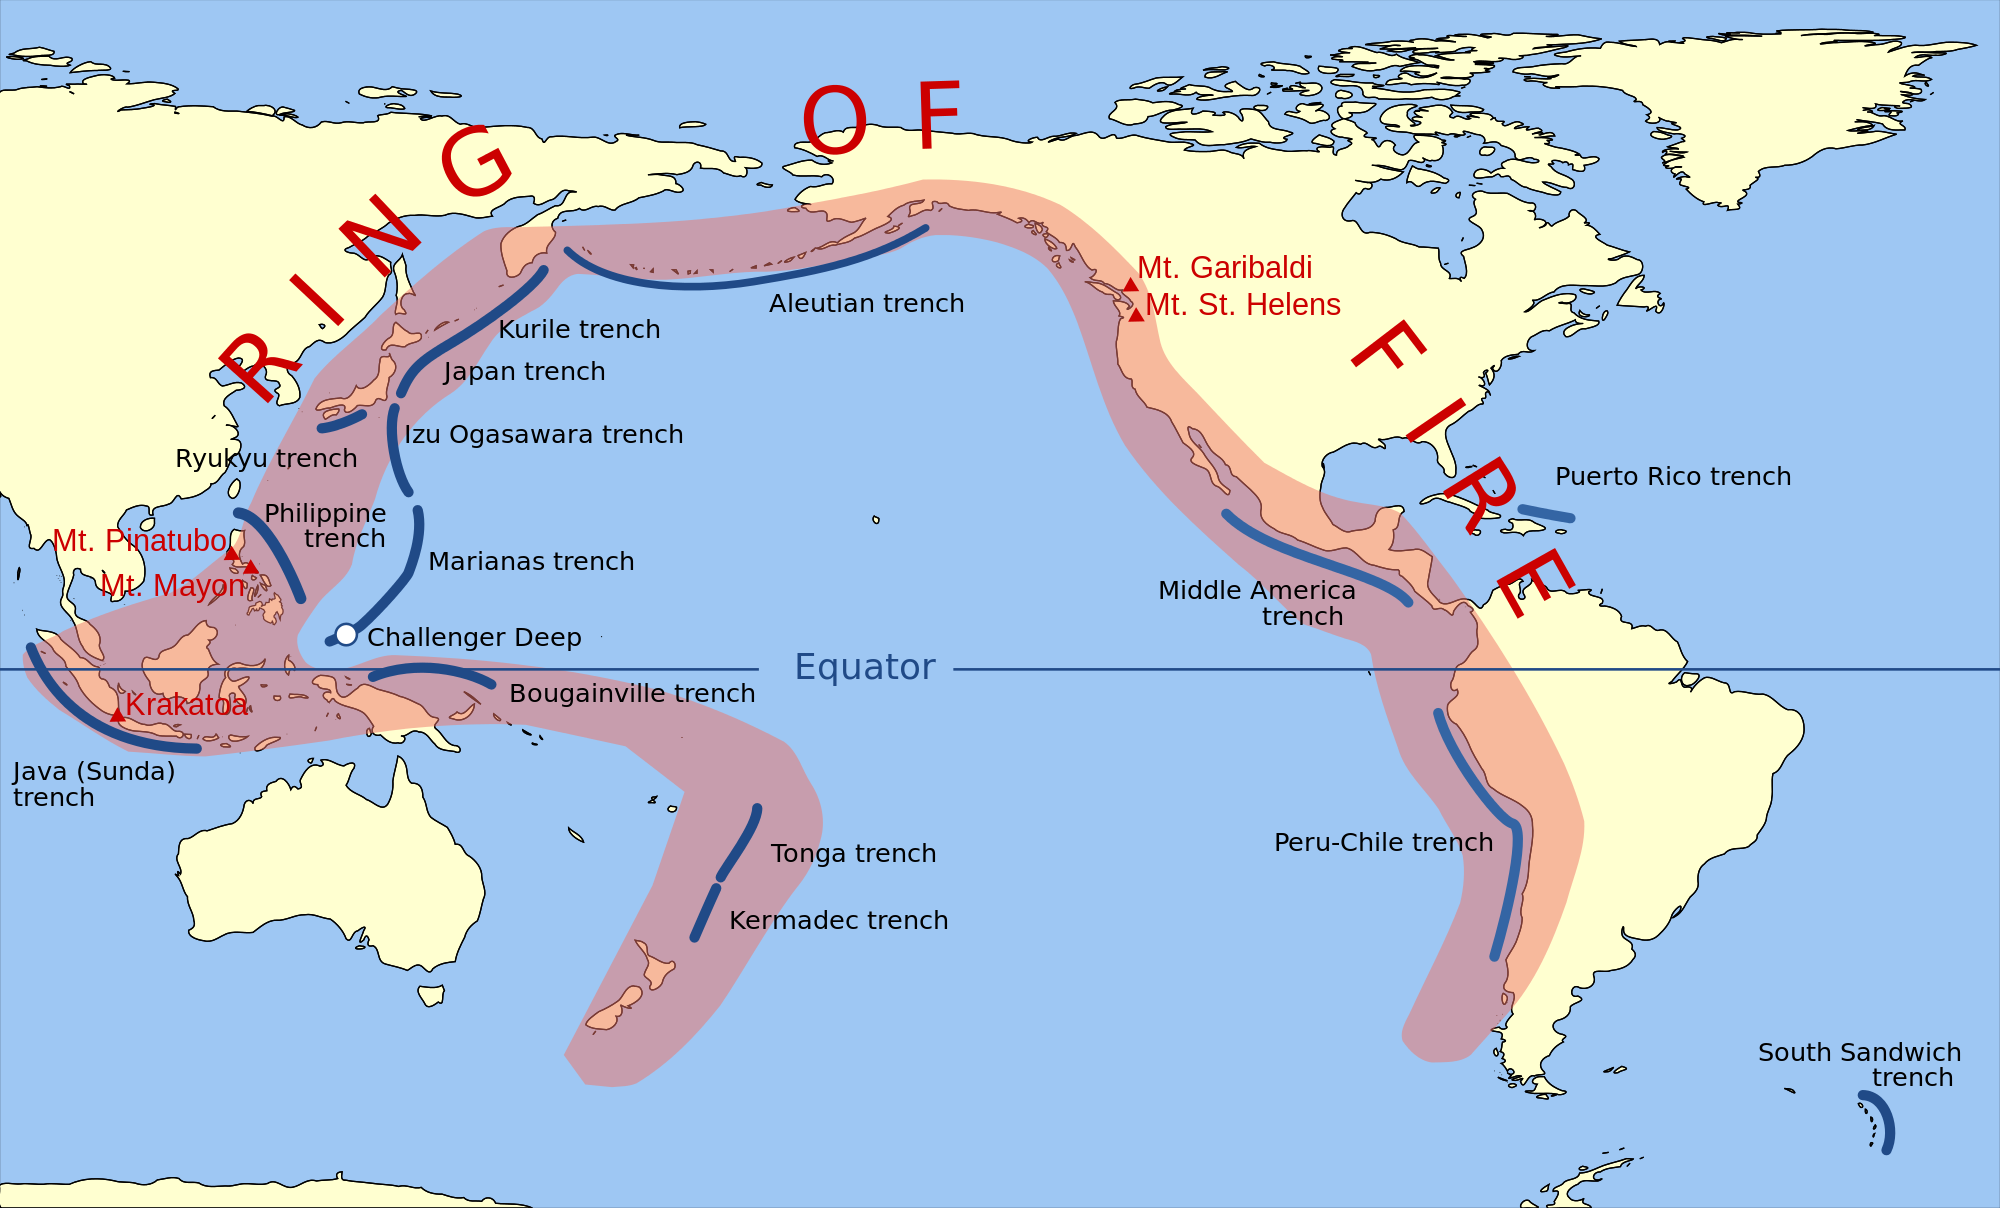 earthquake chile february 2016, earthquake coquimbo chile, earthquake antofagasta february 2016, increasing earthquake chile february 2016, The Peru-Chile trench is part of the Pacific Ring of Fire.